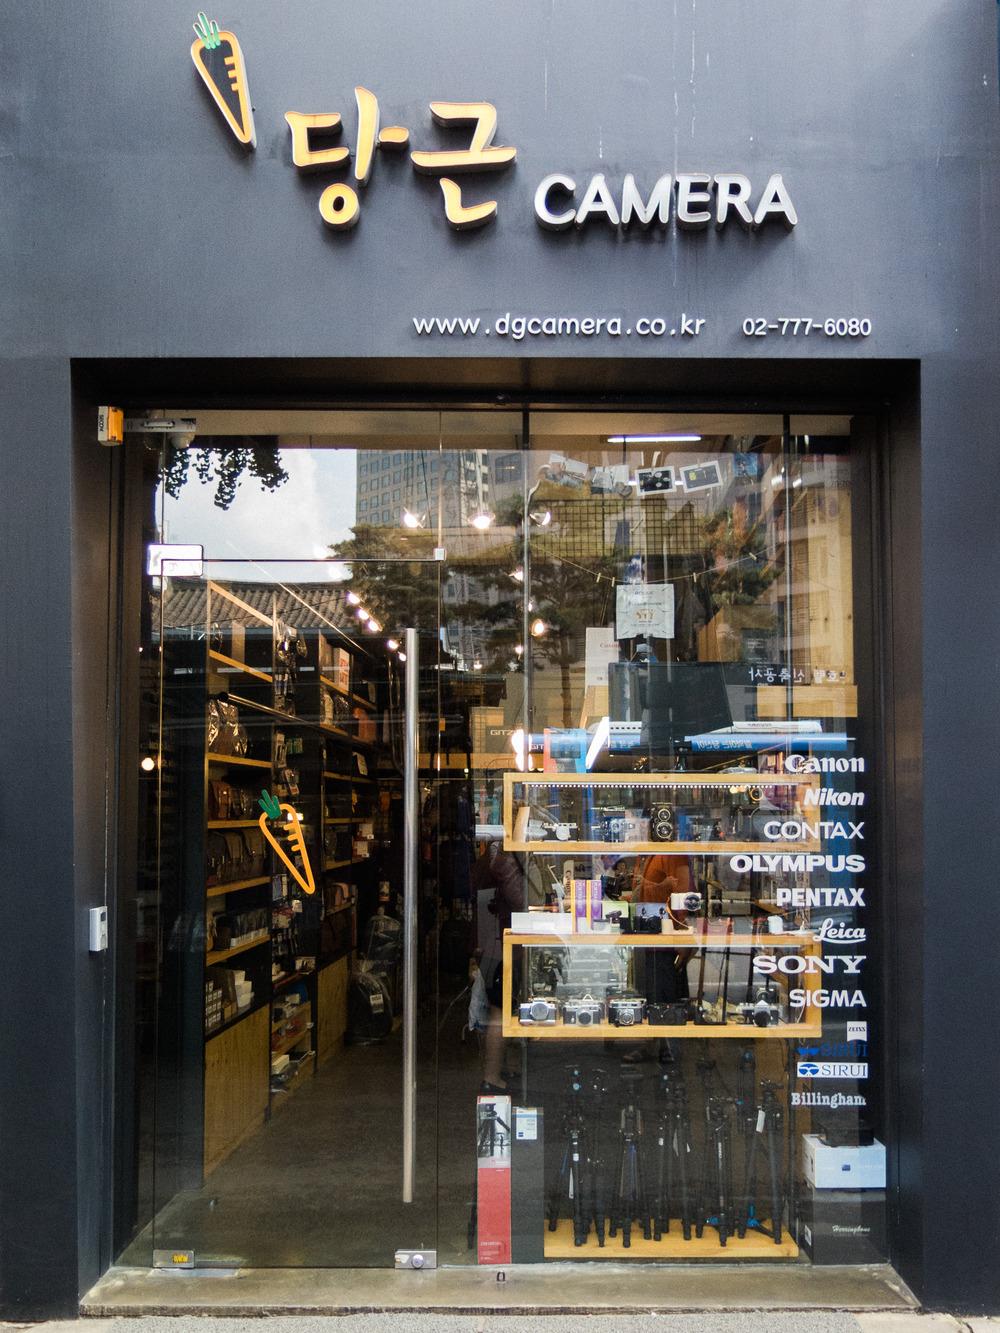 DG Camera, Seoul